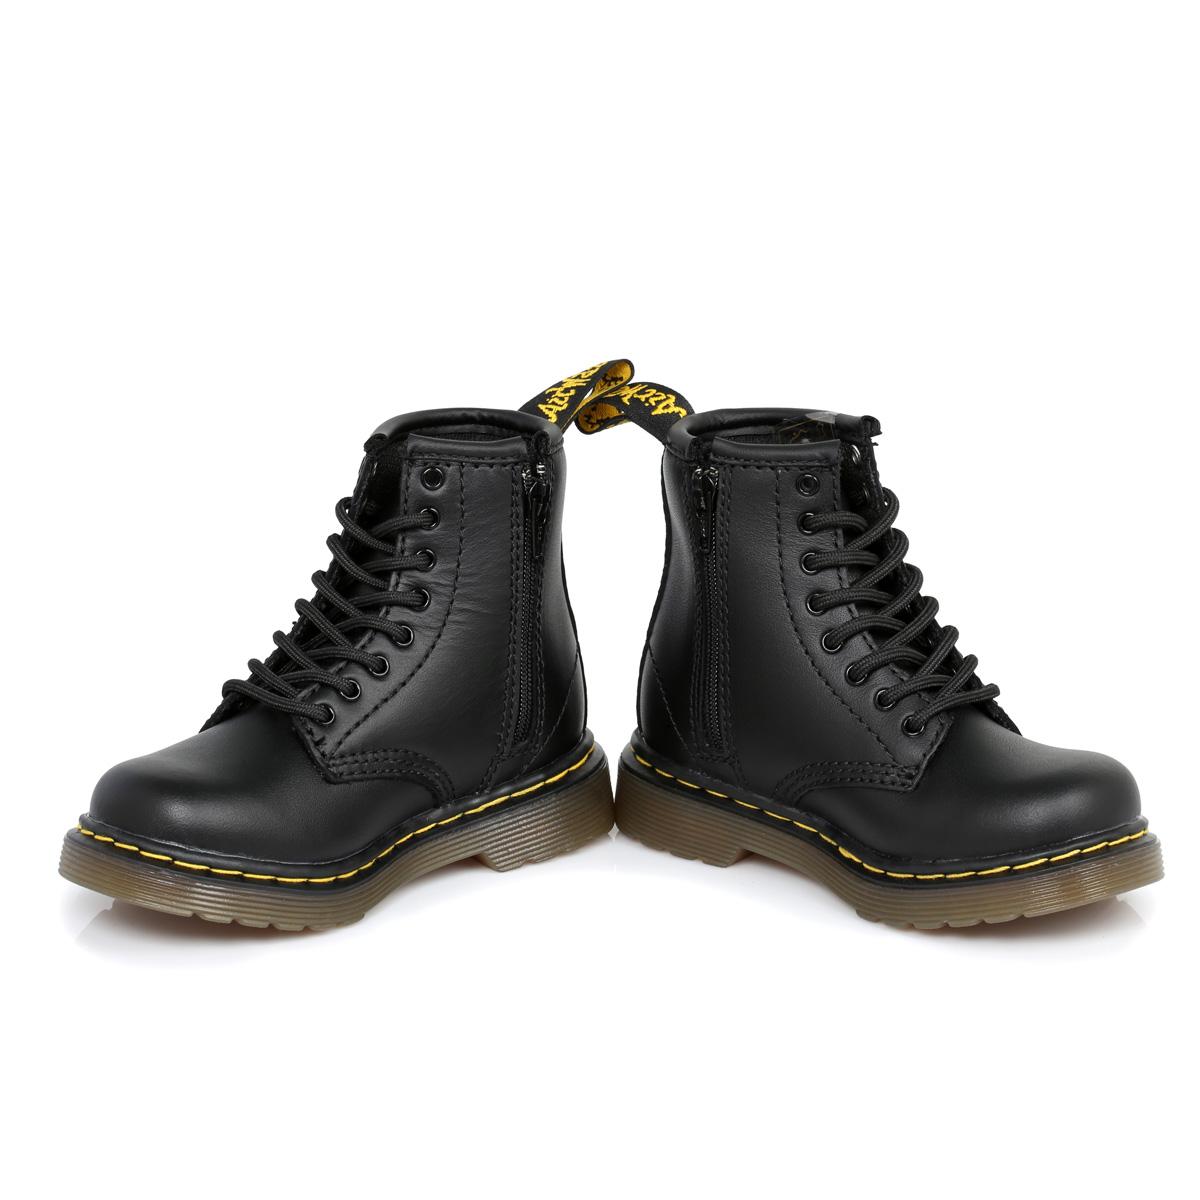 dr martens black brooklee leather boots sizes 6 9 ebay